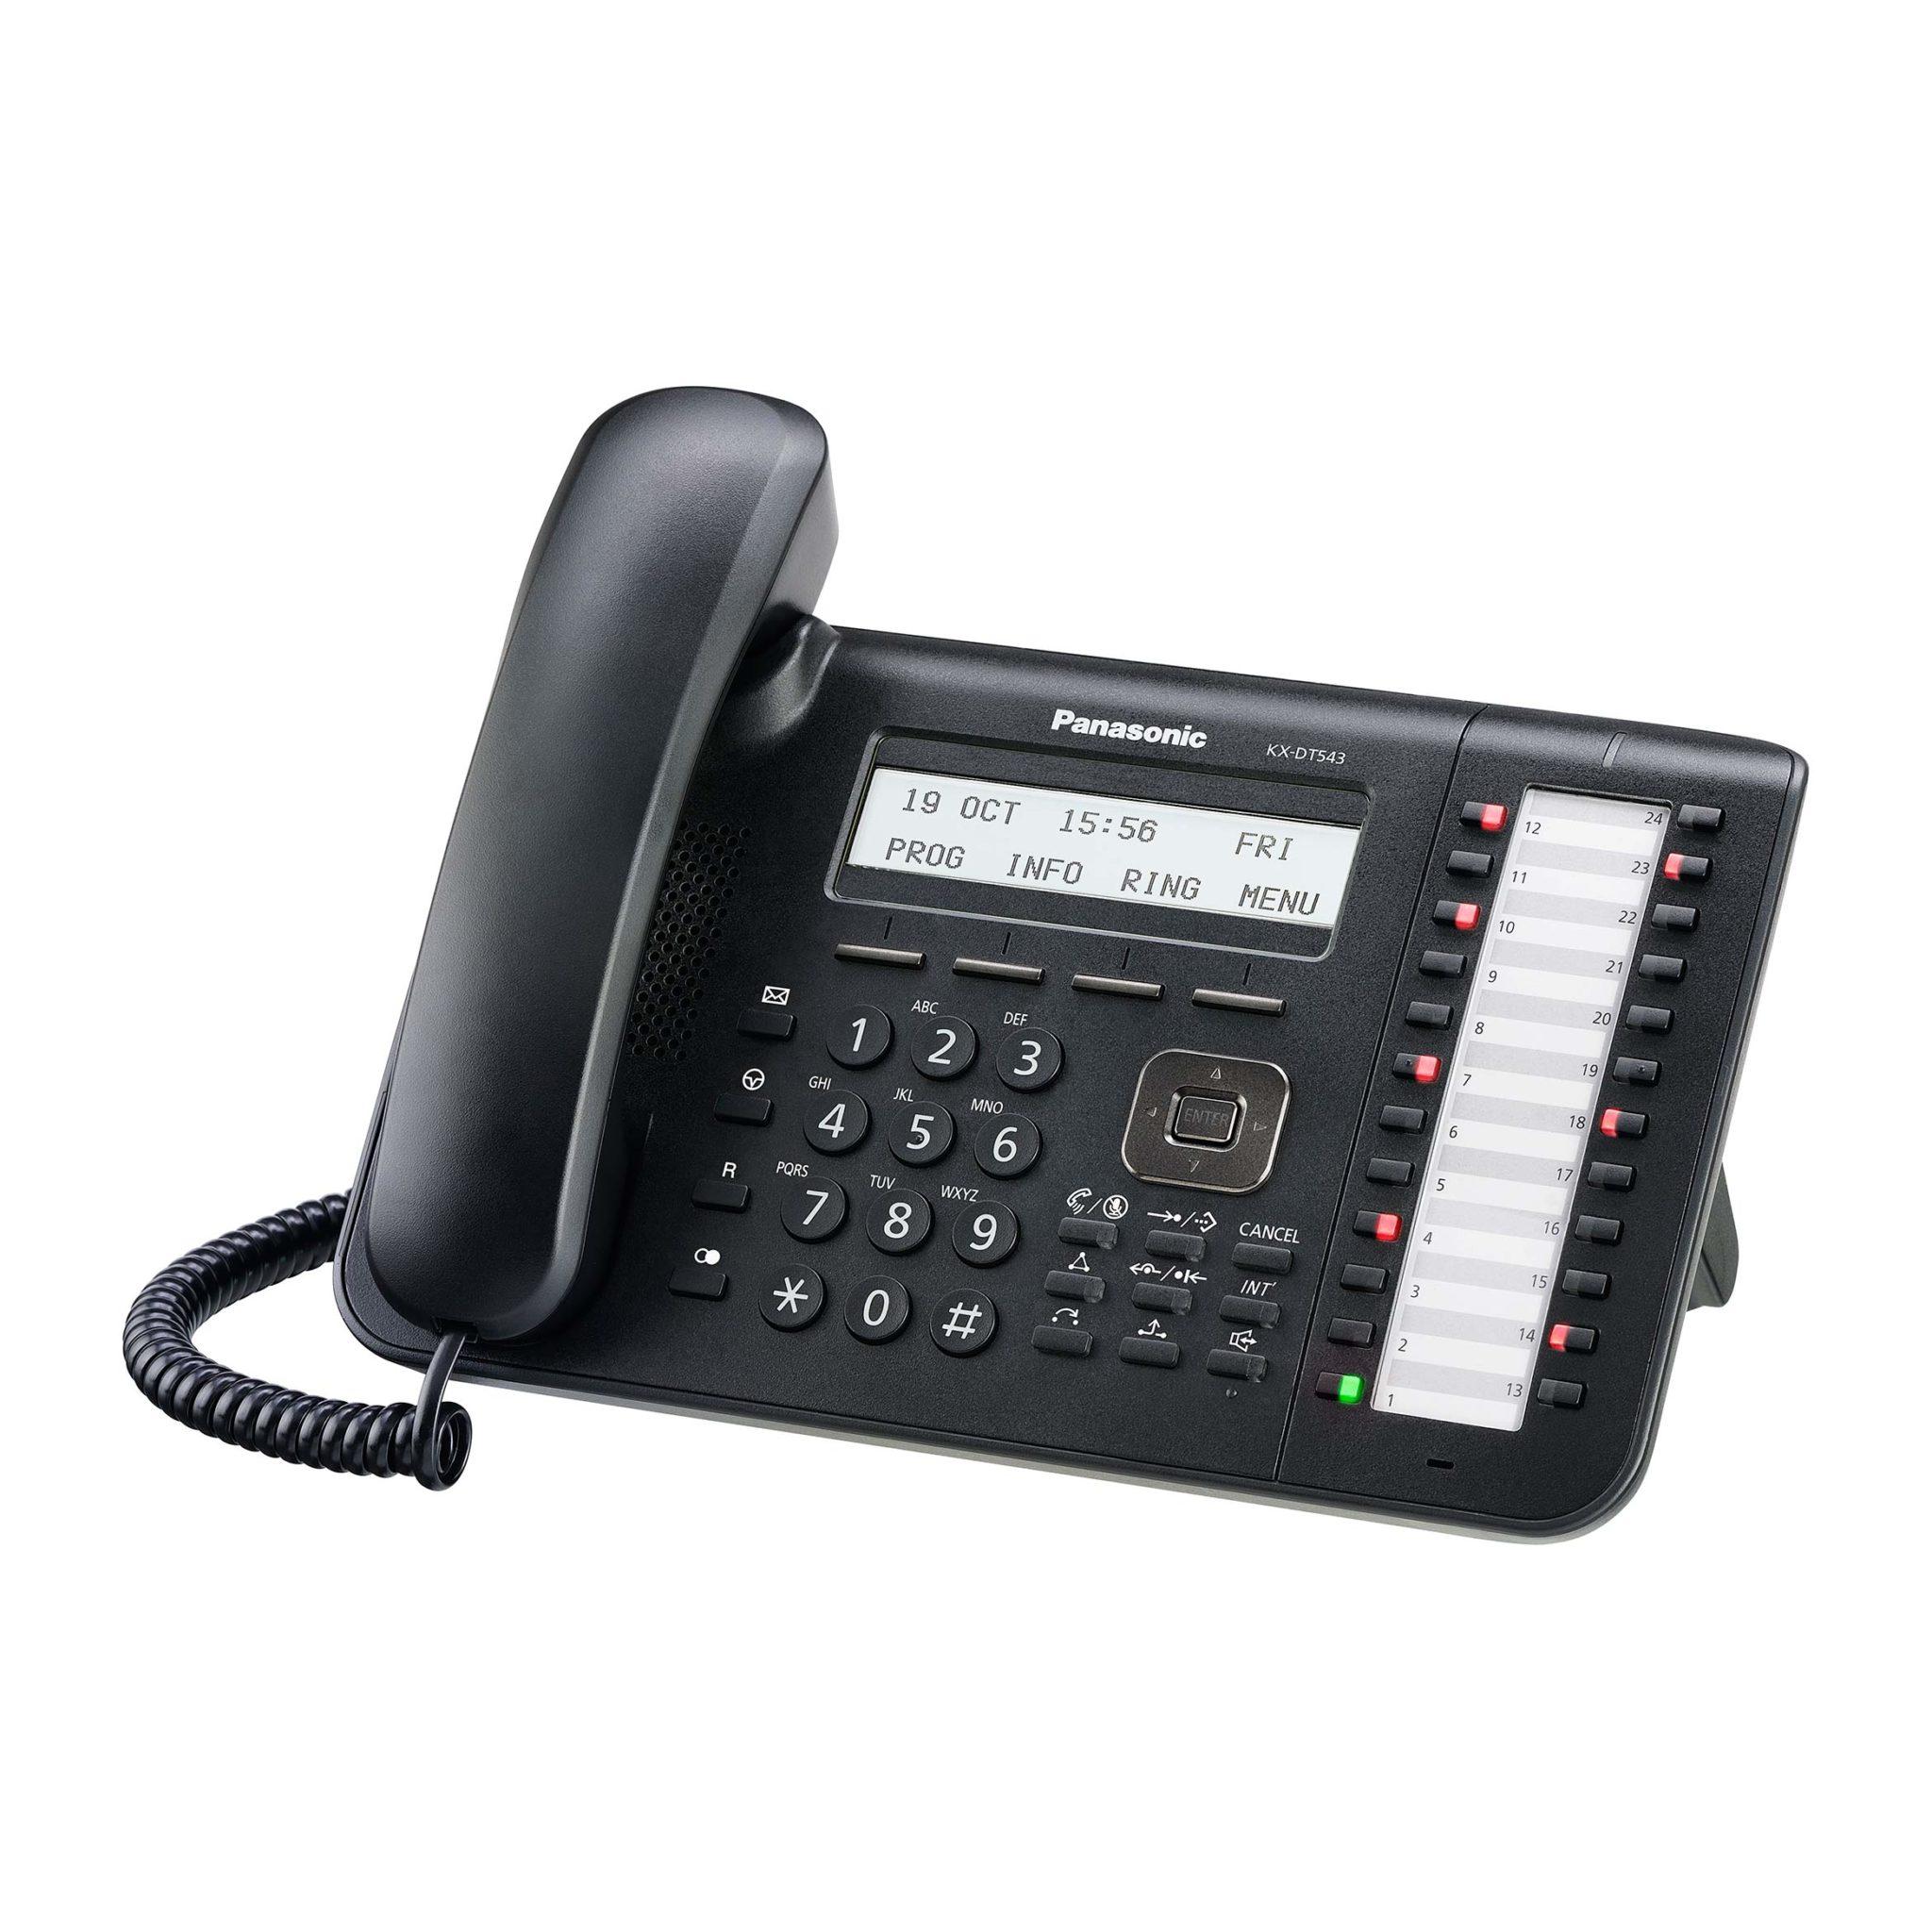 telefono panasonic kx-dt543 centralita panasonic ns500-ns700